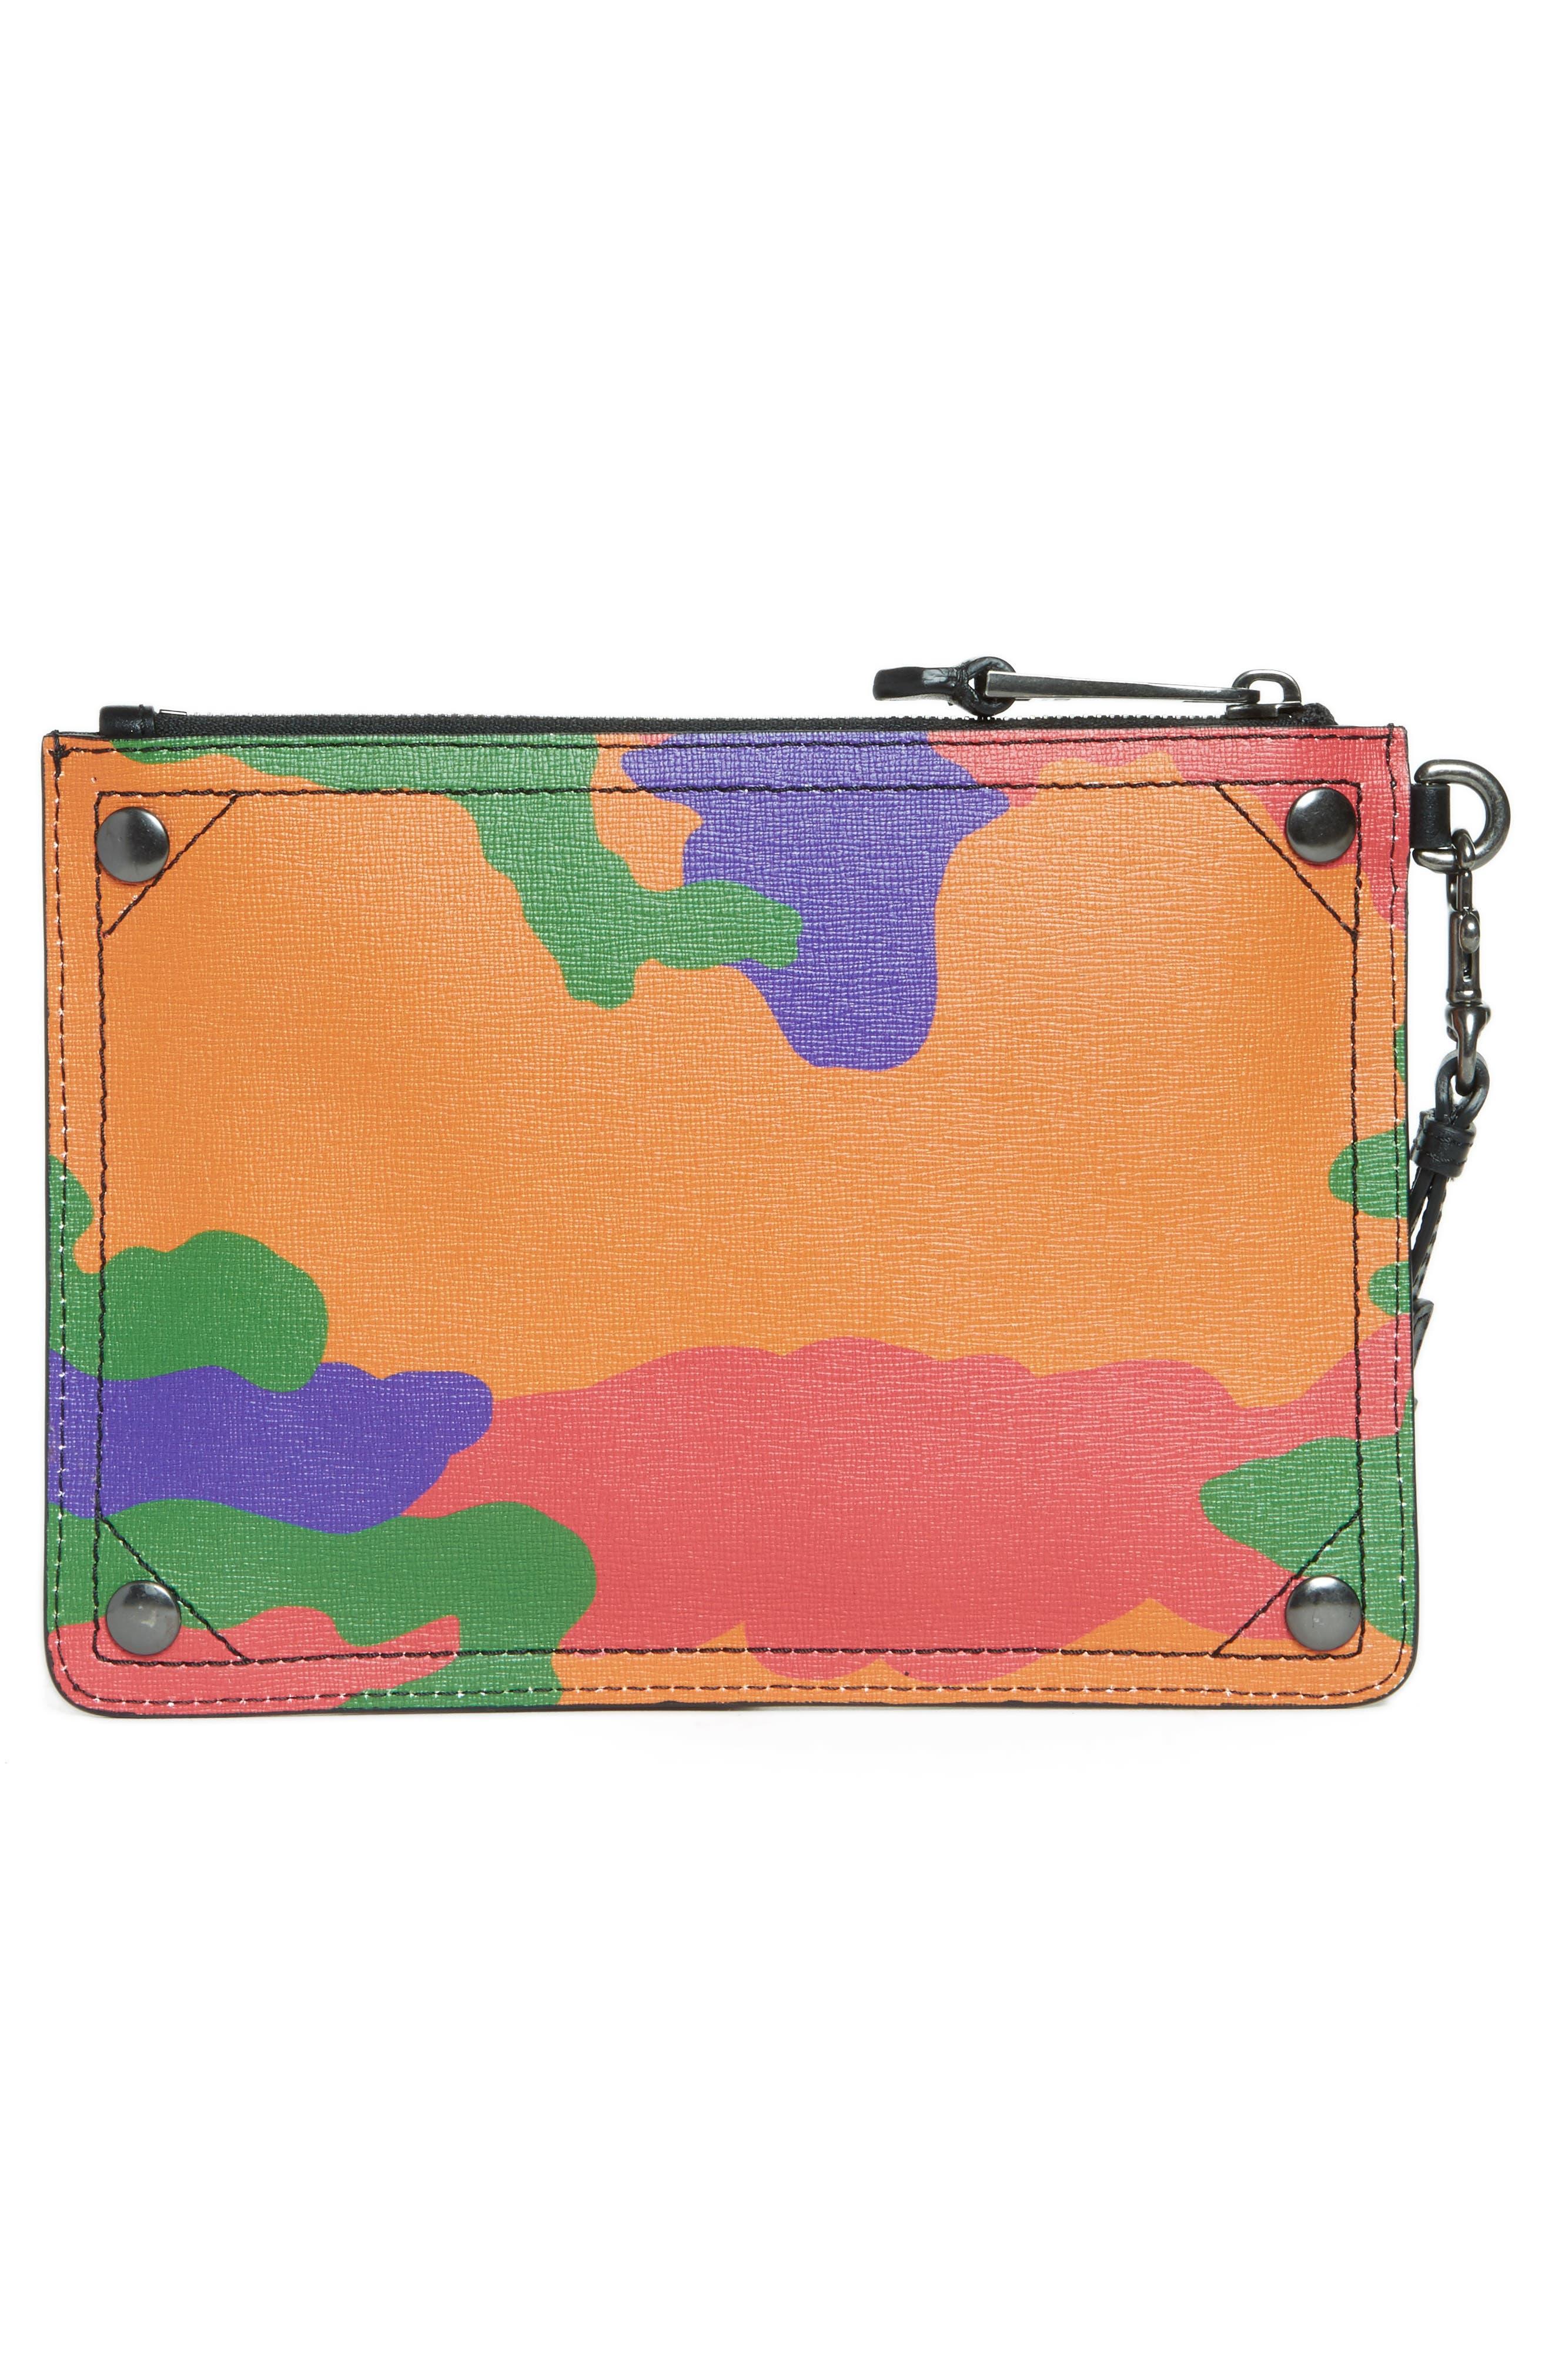 Multi Camo Print Leather Zip Pouch Wristlet,                             Alternate thumbnail 4, color,                             Camo Multi